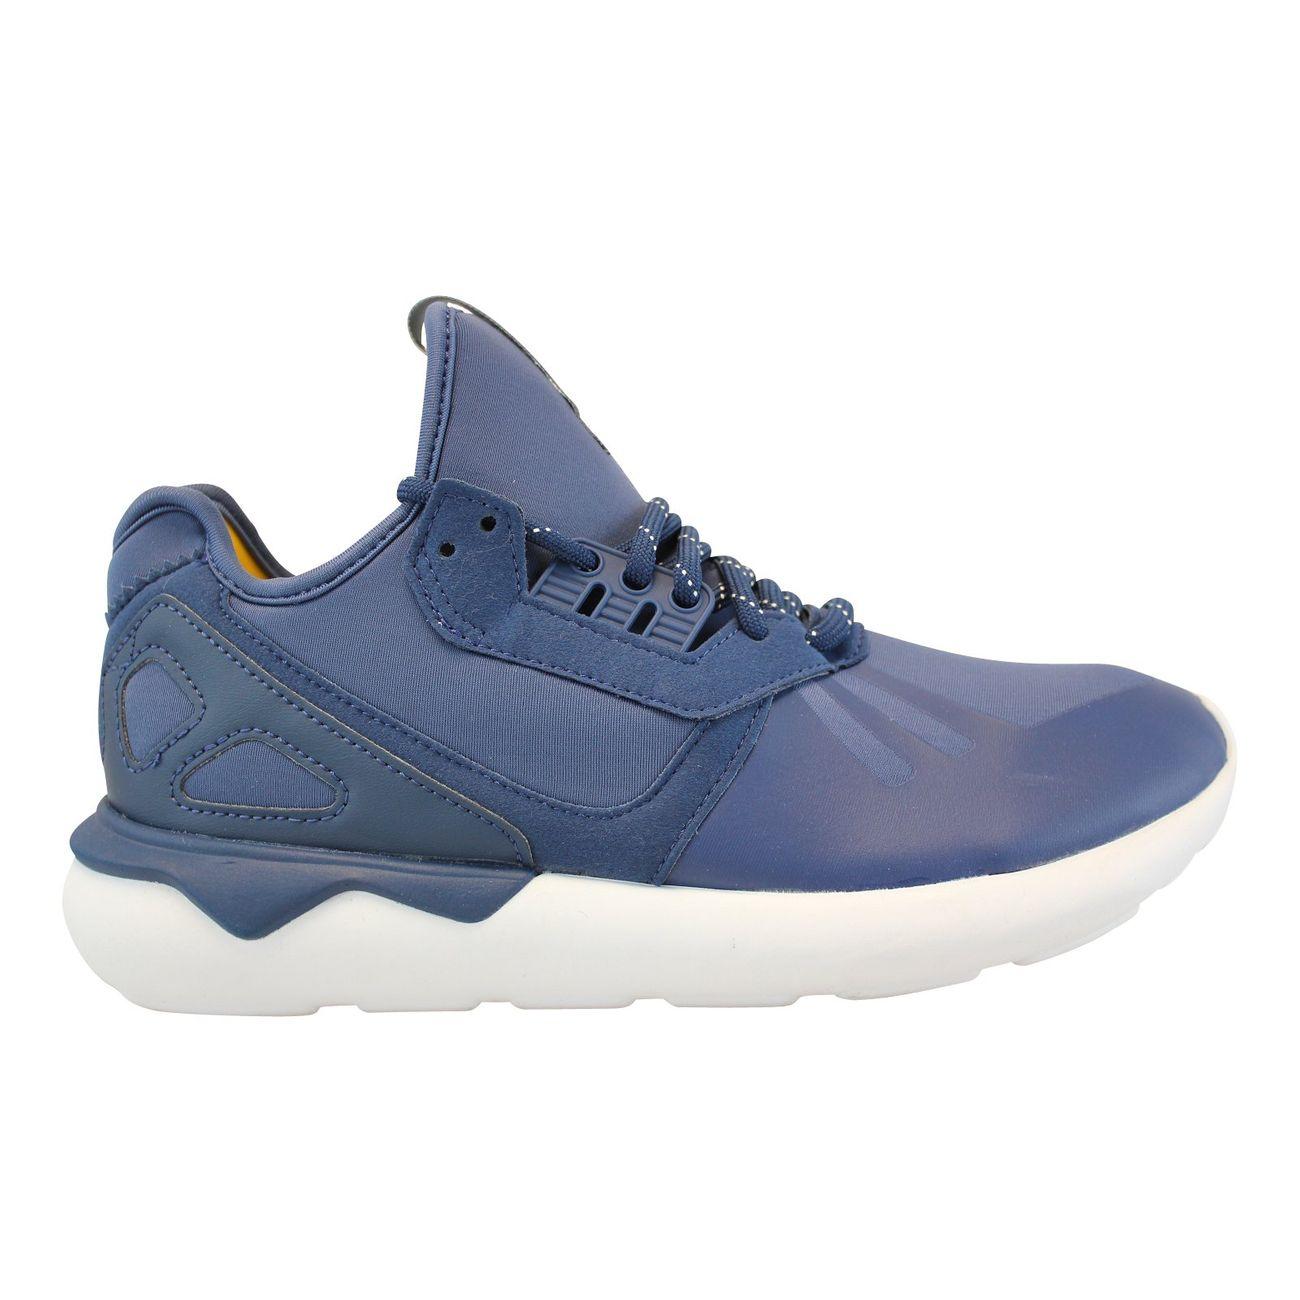 adidas Chaussures Tubular Runner - Ref. S81507 adidas soldes aR5hkgCz